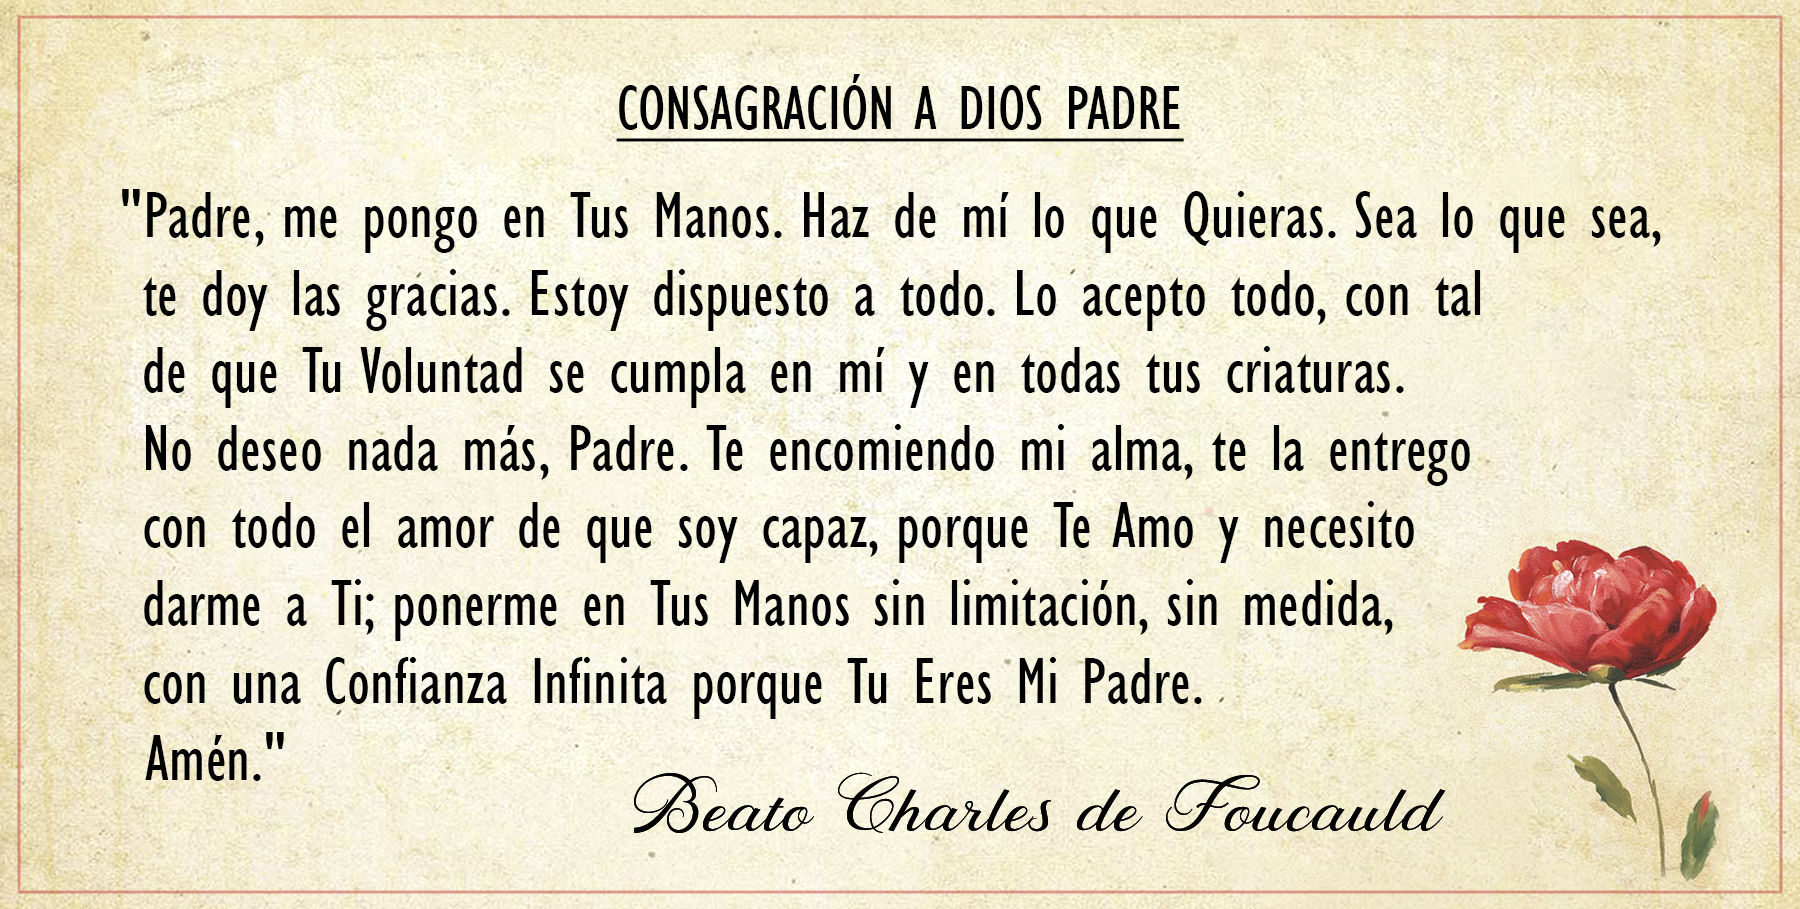 Consagracion -